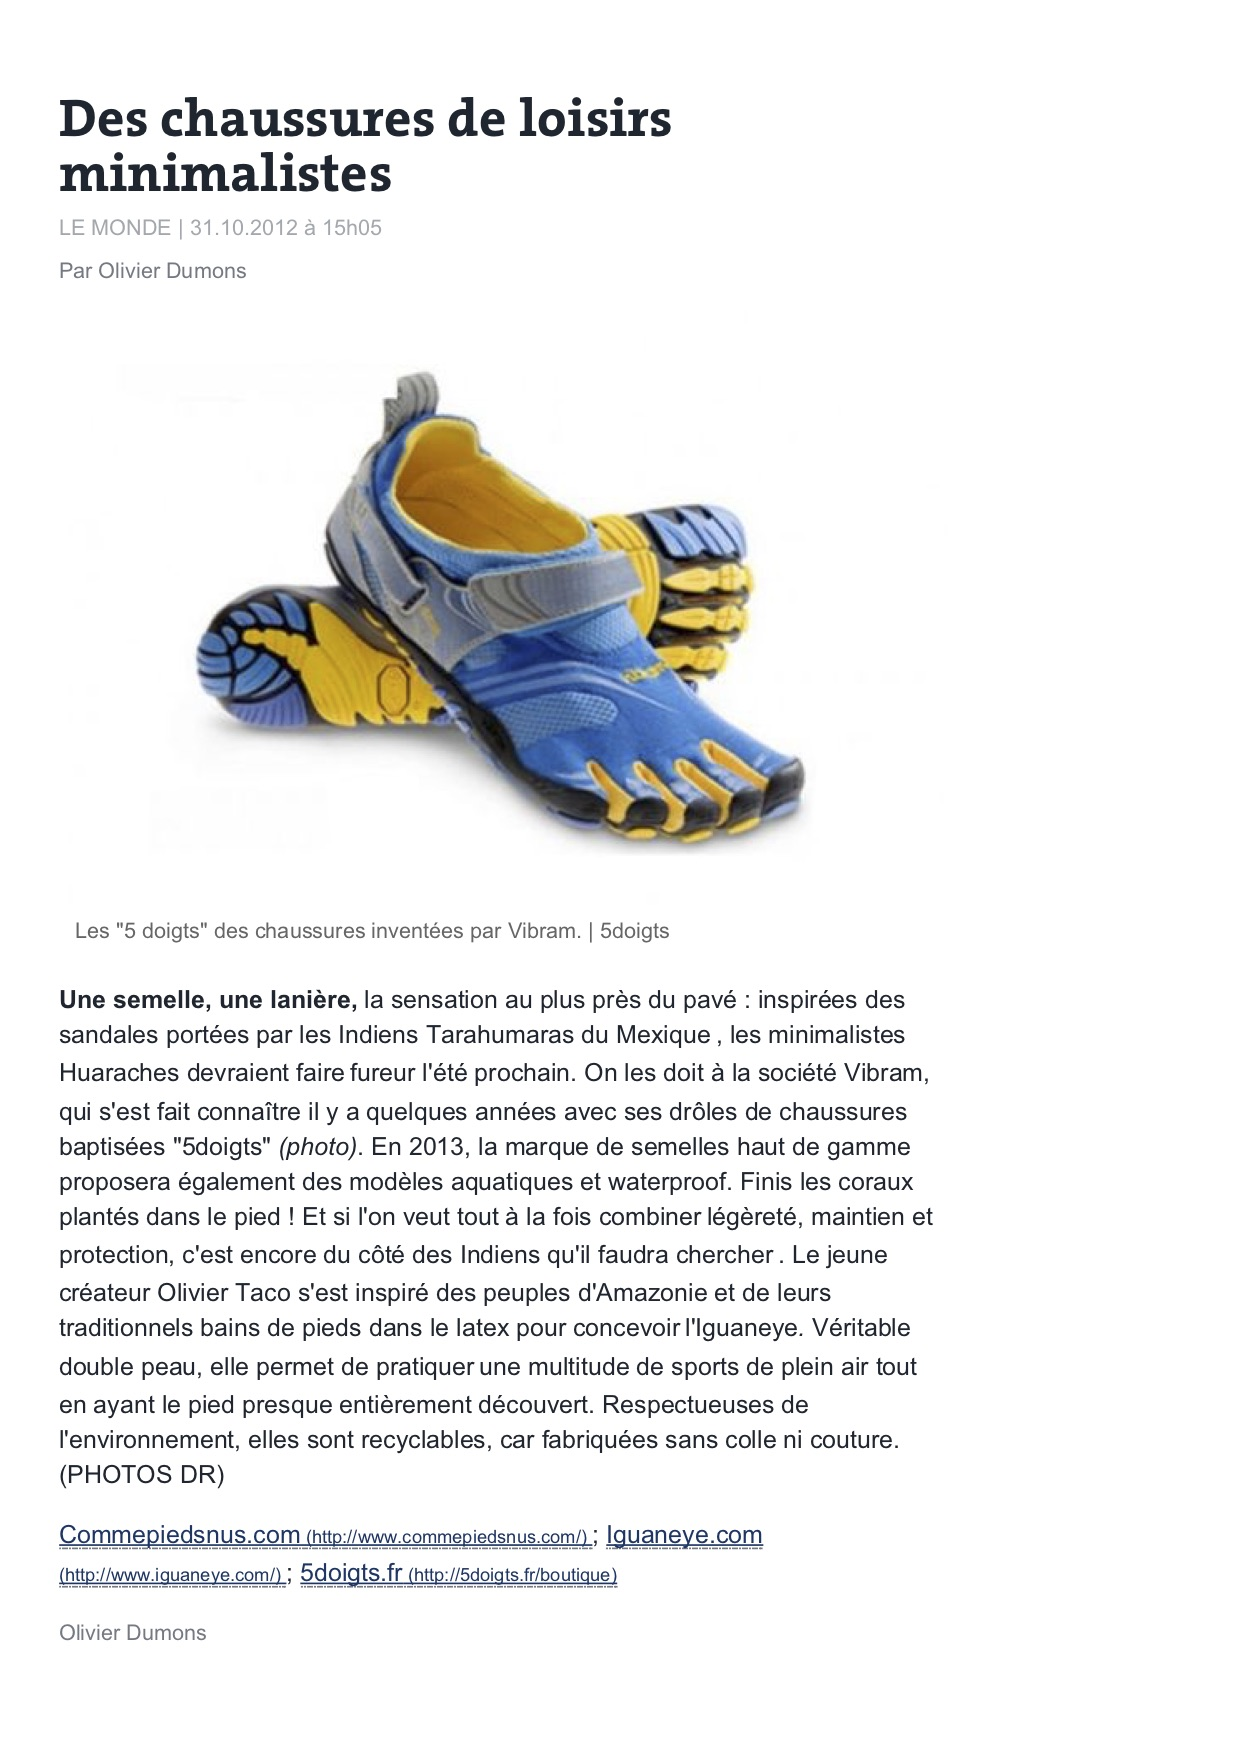 Origine chaussures minimalistes Le Monde